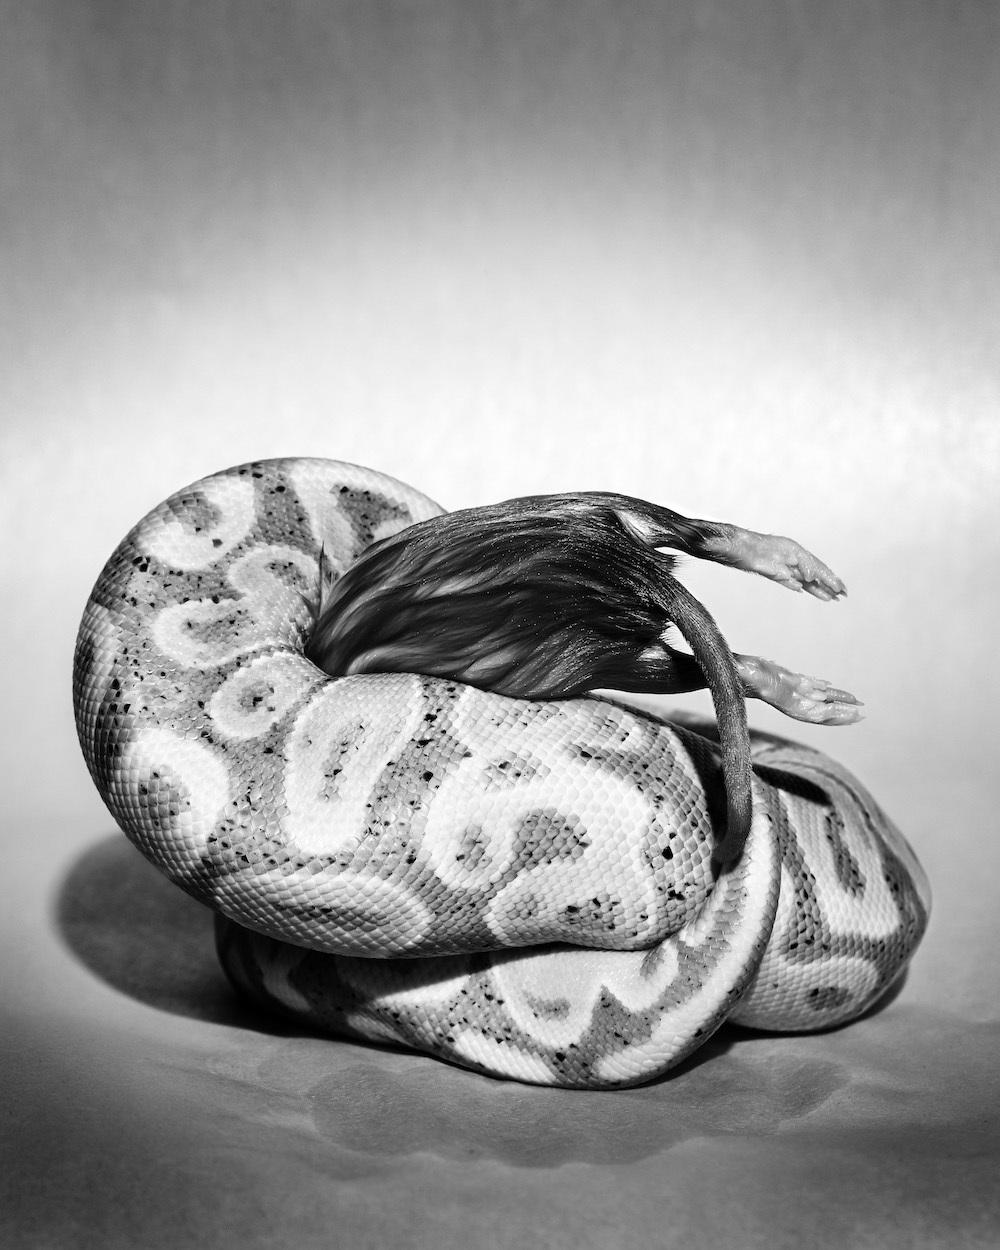 Casanova Cabrera (BFA 2018 Photography and Video), <em>Sculpture I (Banana Constricting Rat)</em>, 2016, archival inkjet print.